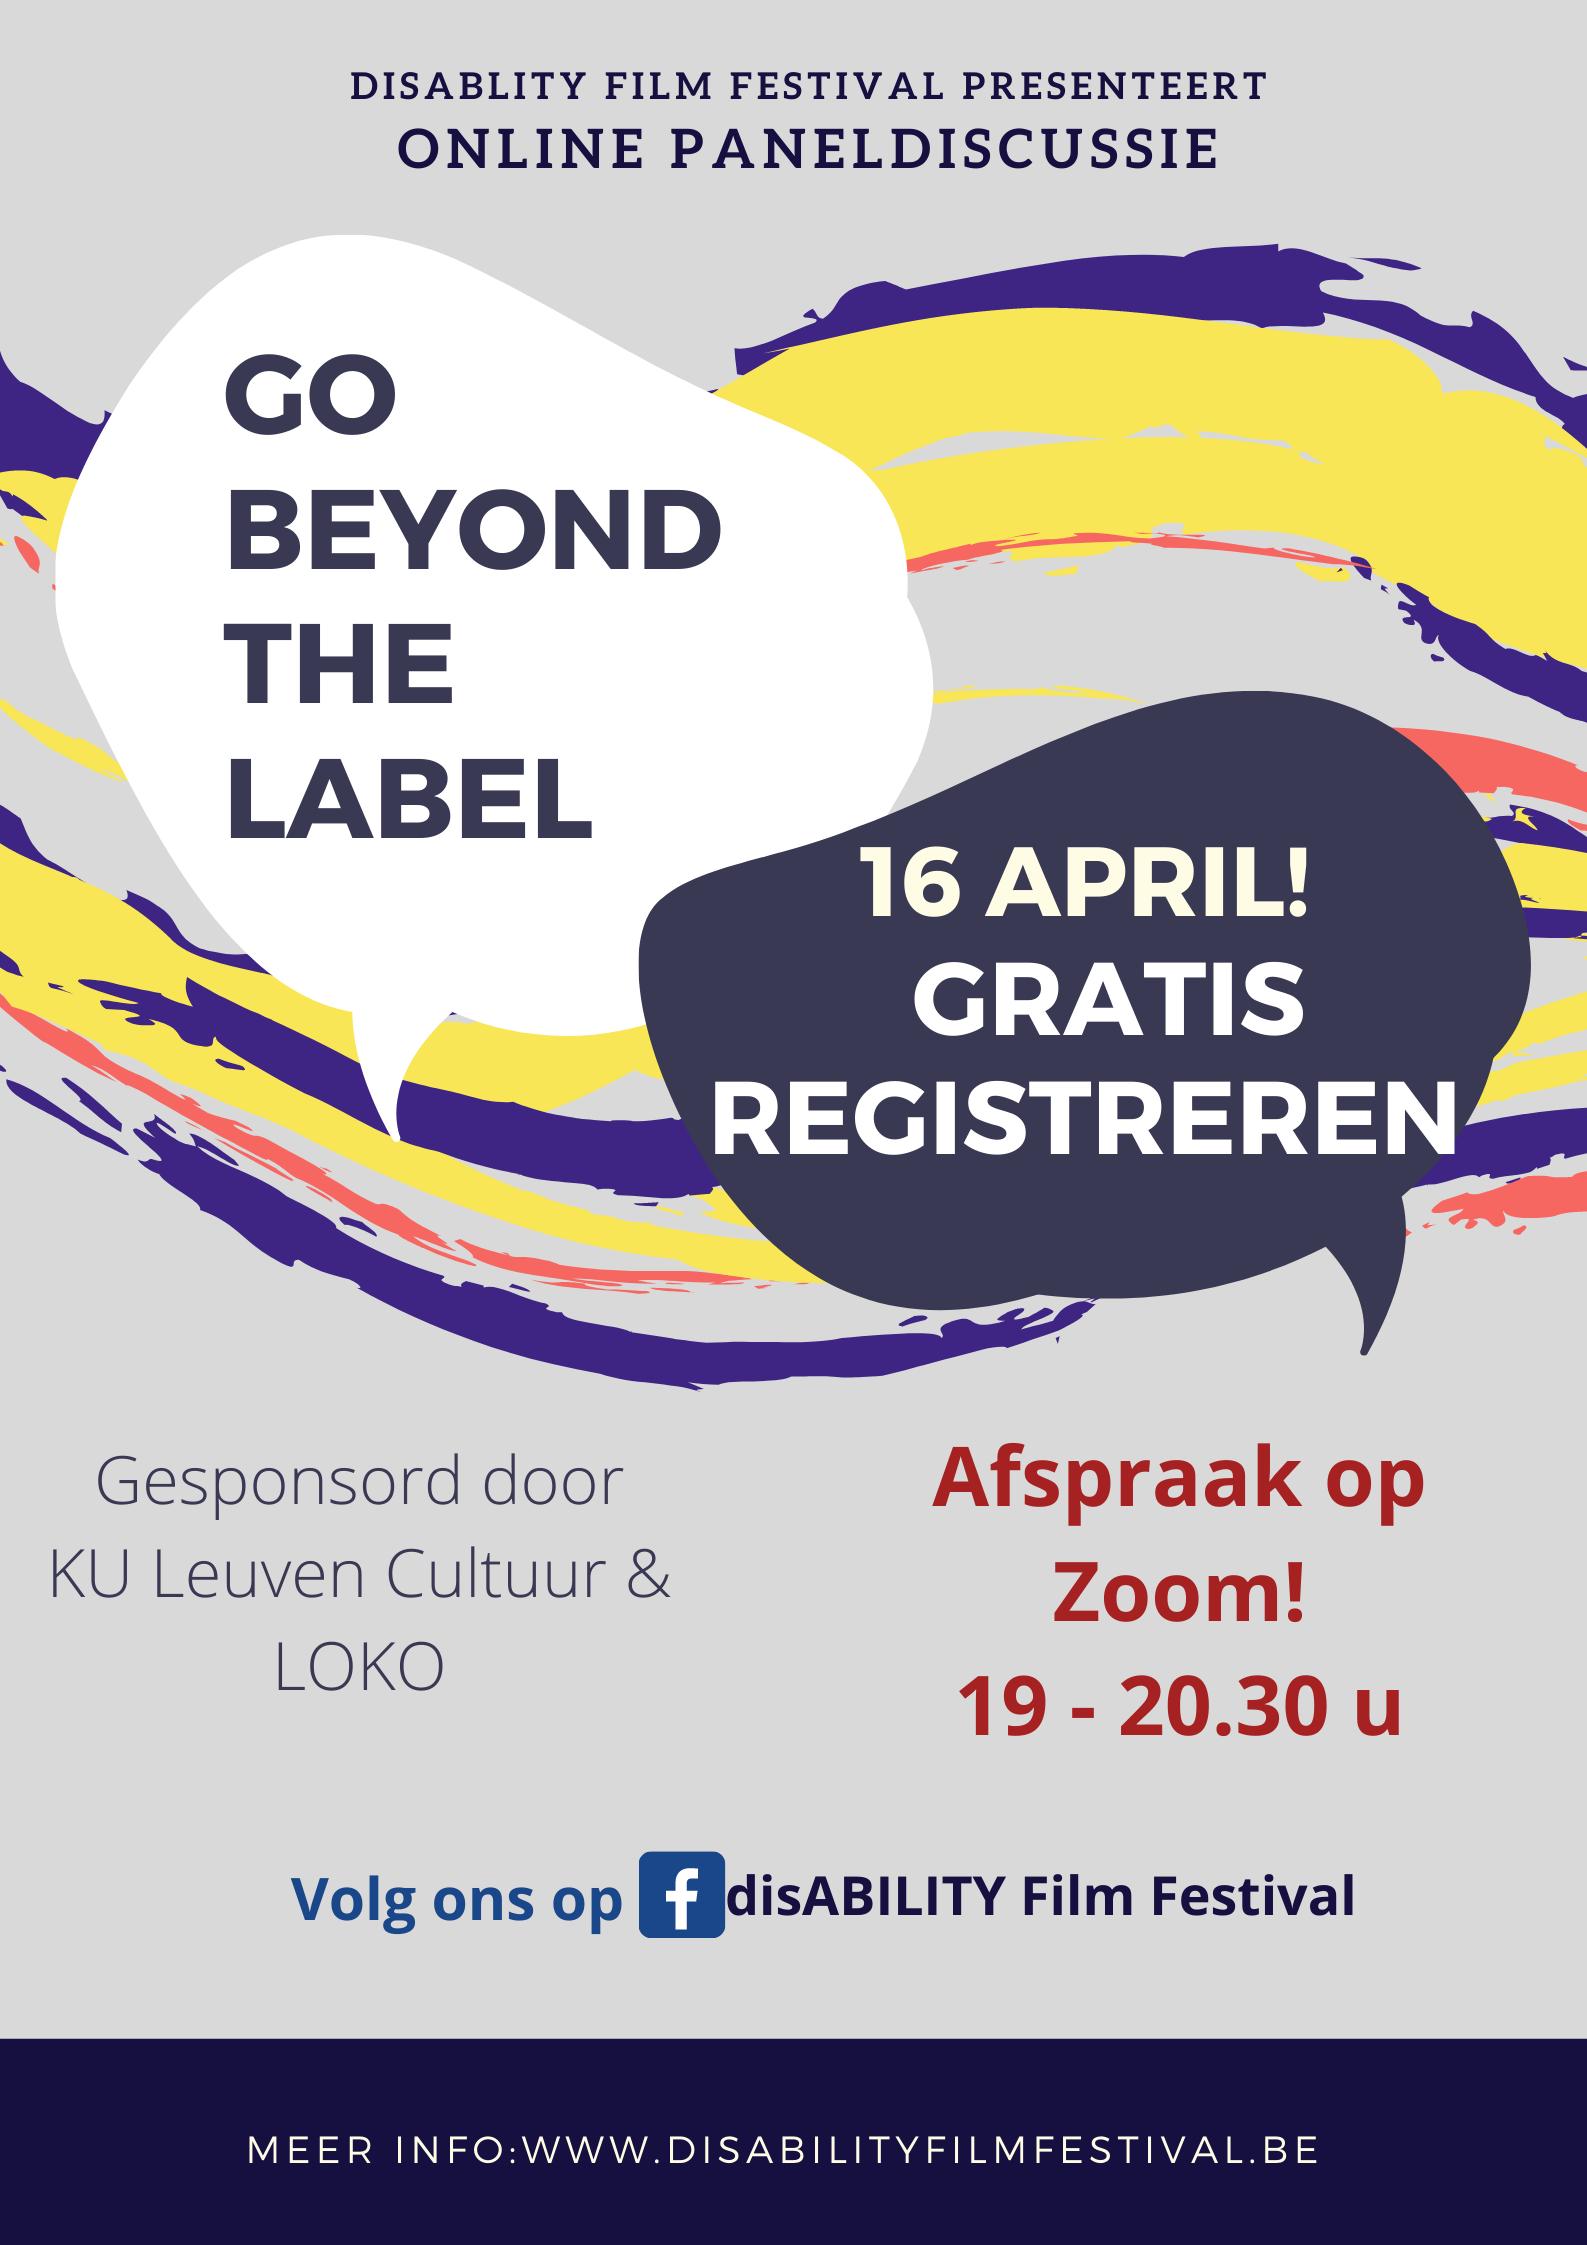 Go beyond the label - online paneldiscussie